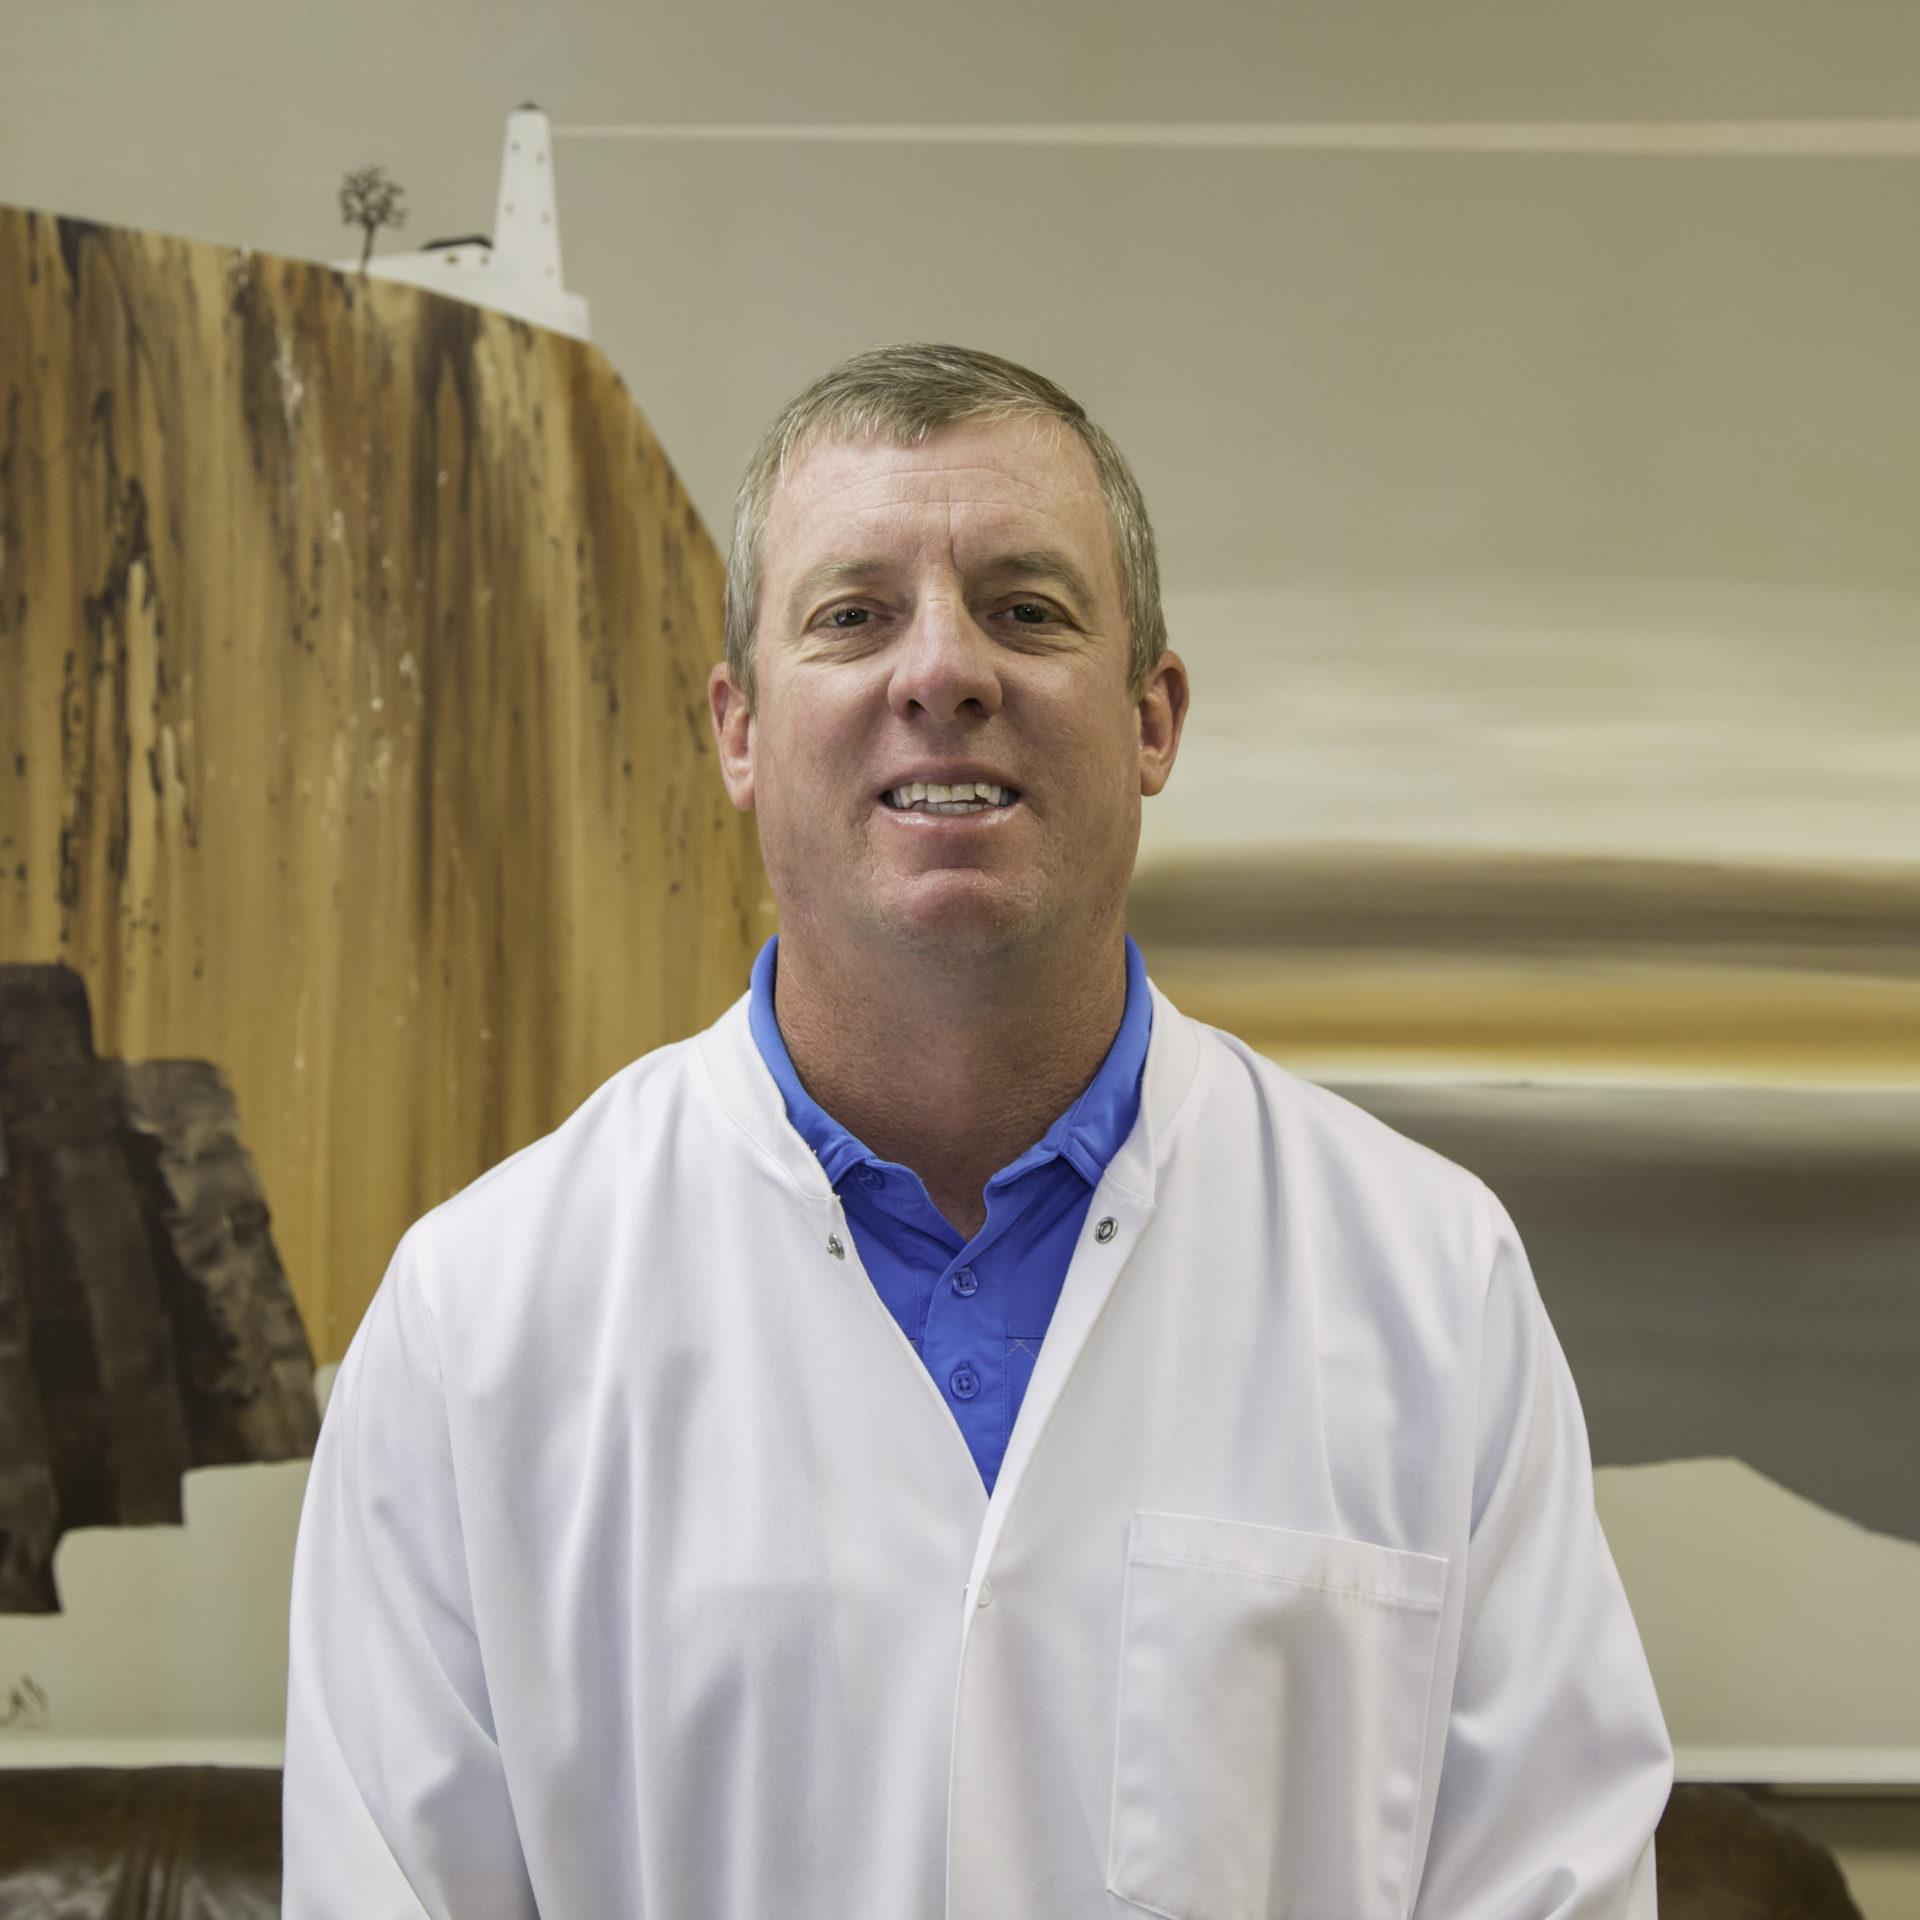 Dr. Stephen Willenborg, DMD